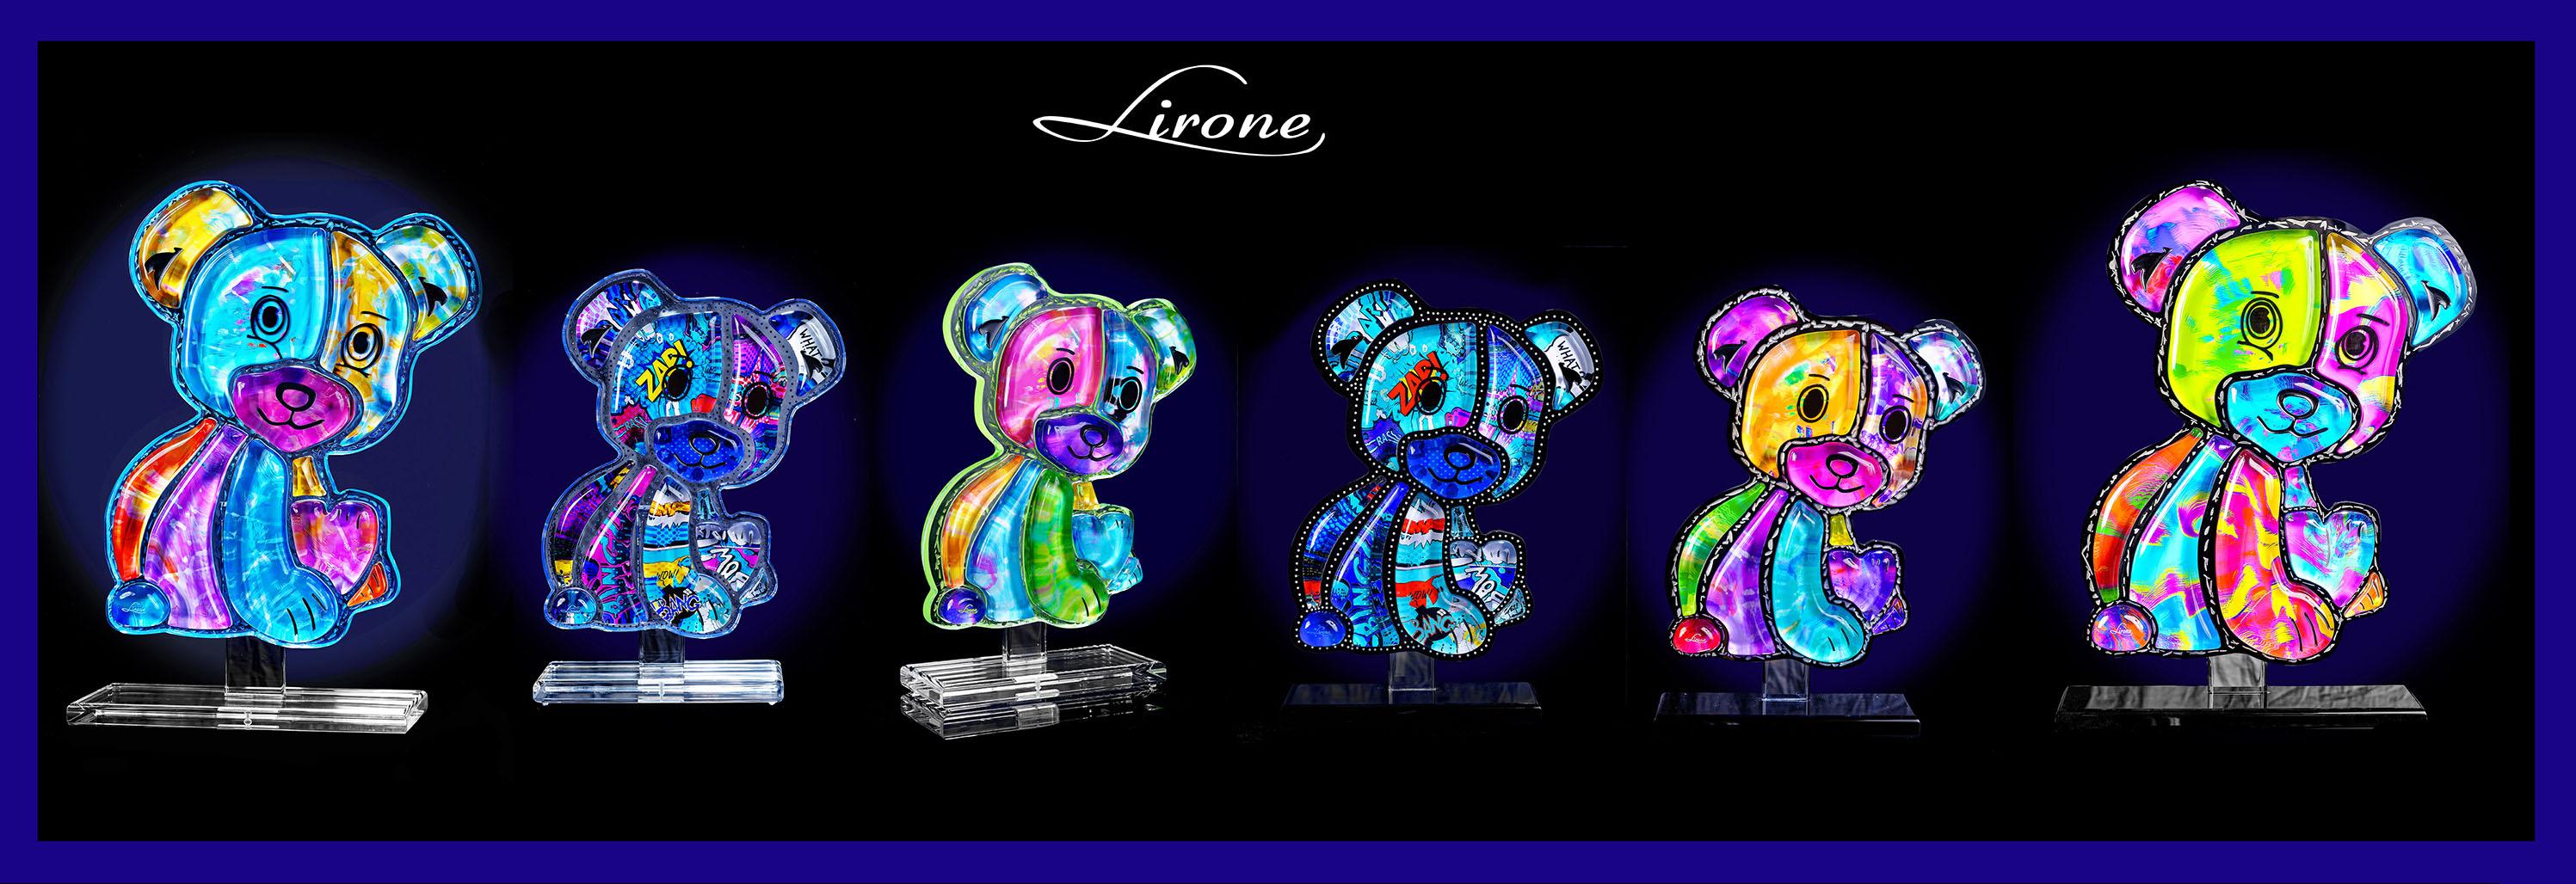 lirone-photographe-plasticien-néon-pop-art-street